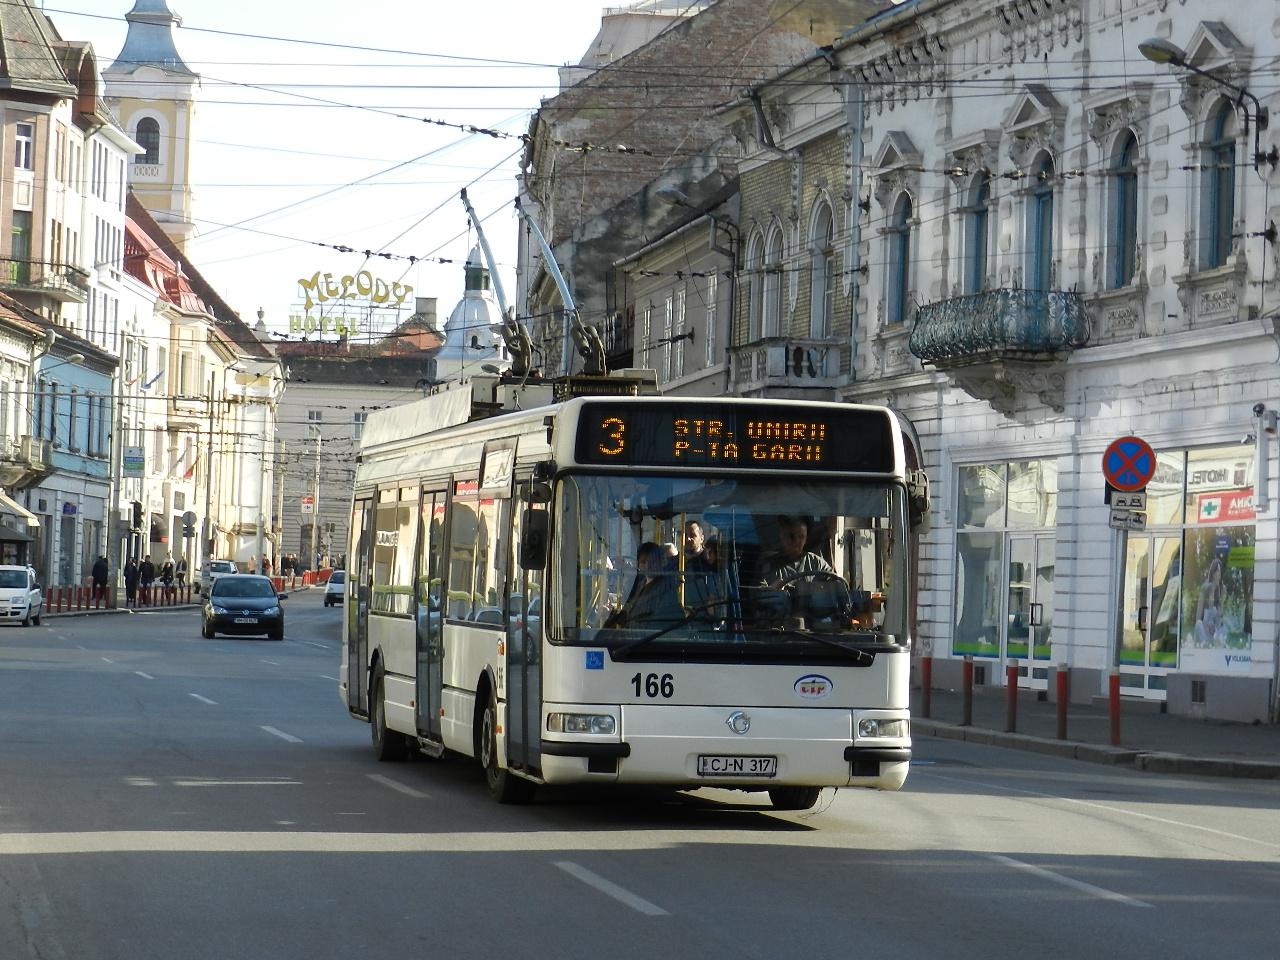 foto © eClujeanul.ro